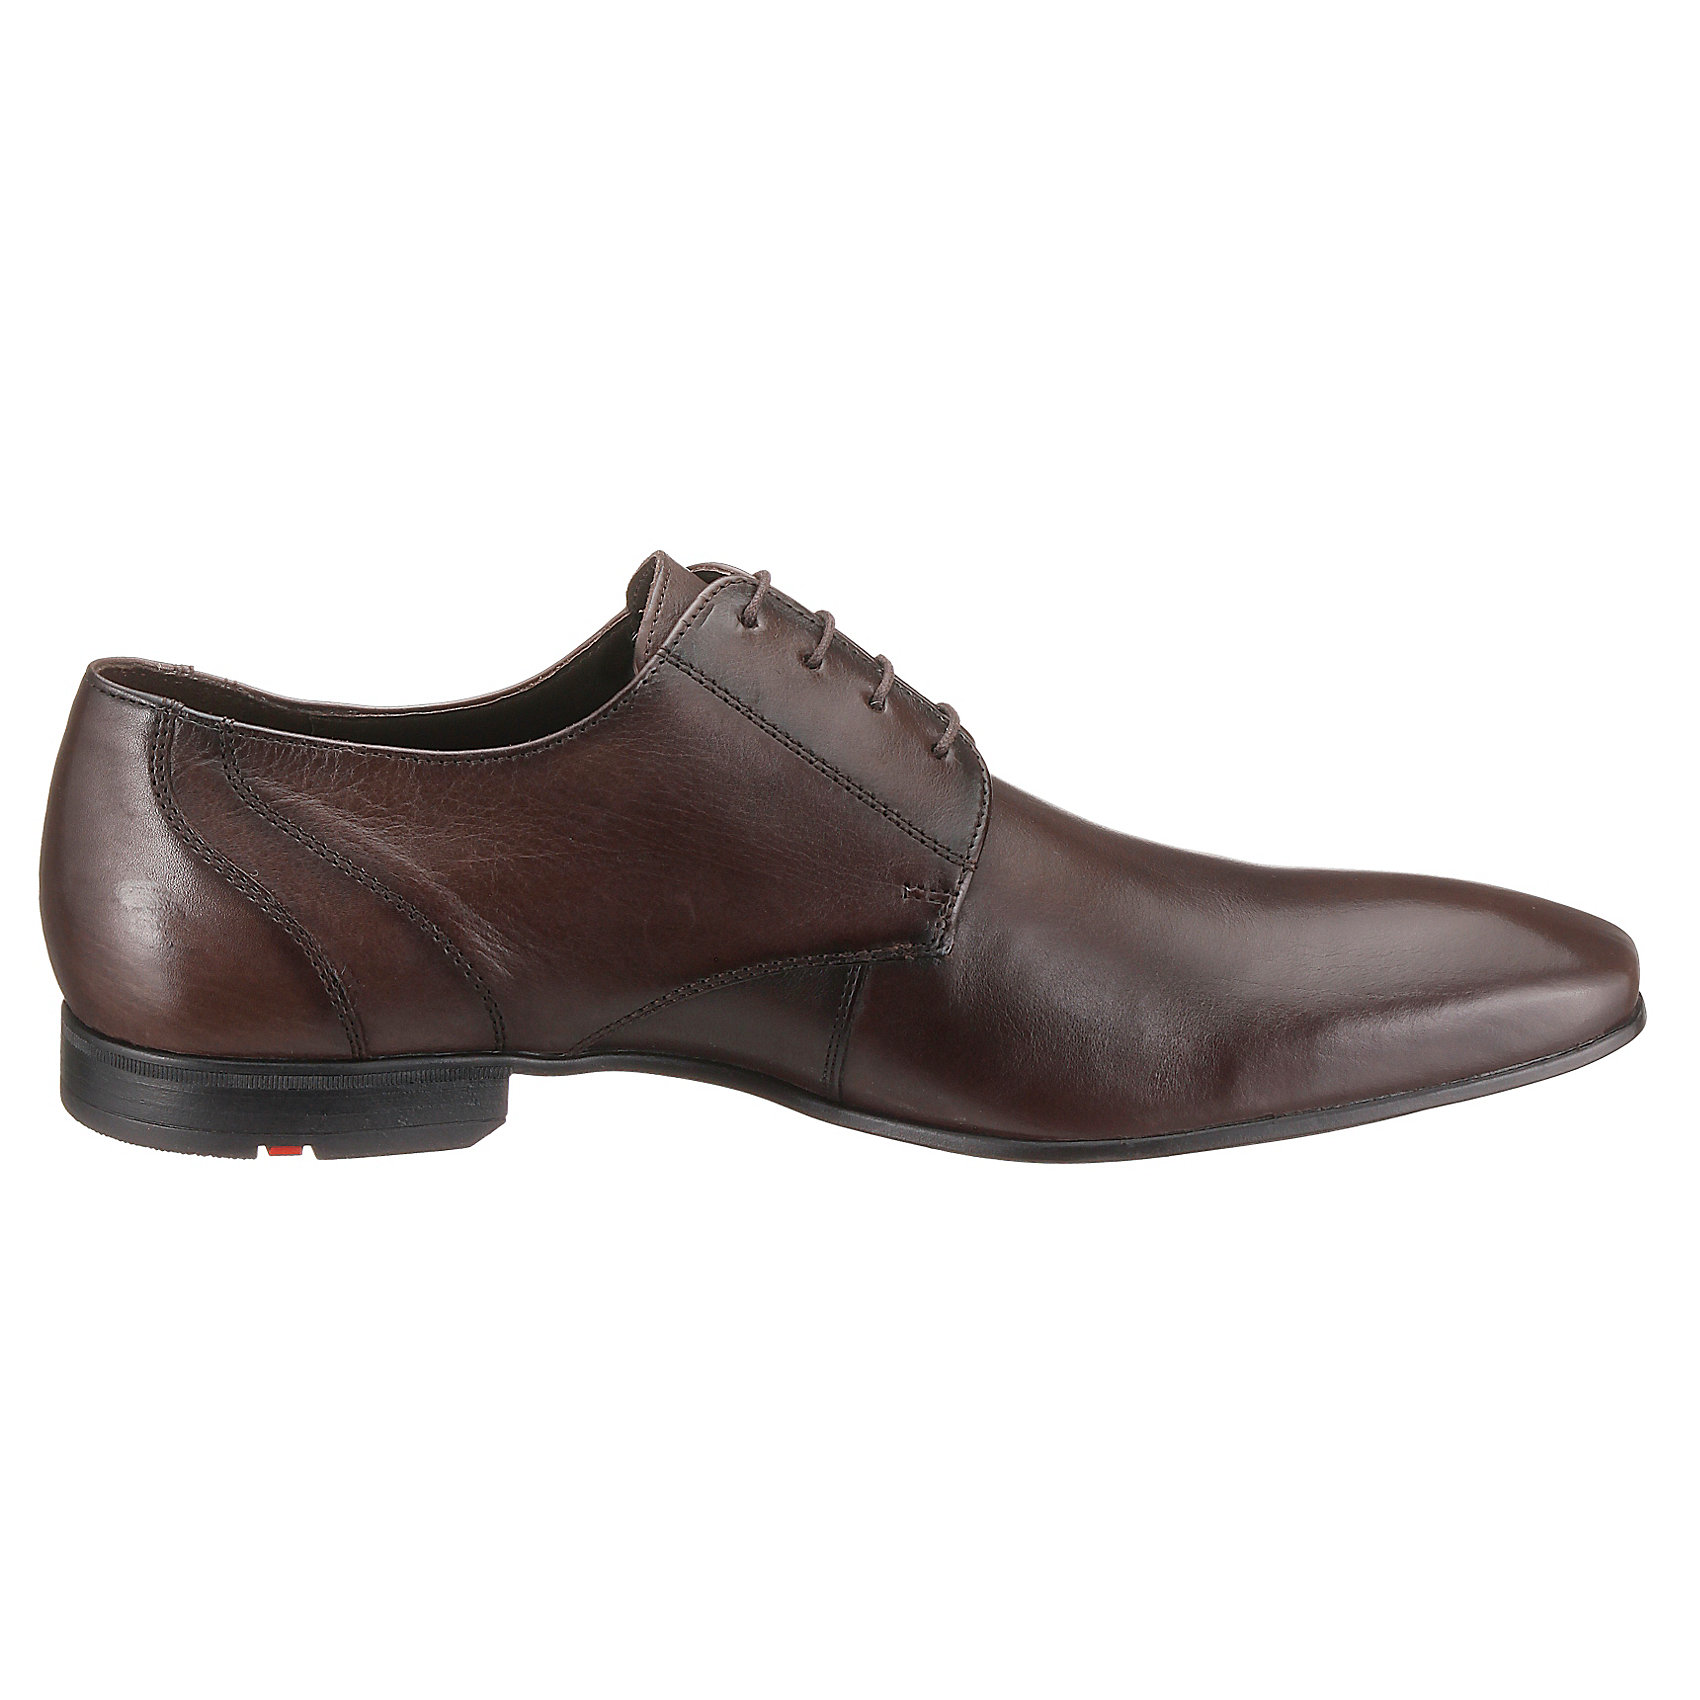 9f2e4548f9f1 Neu LLOYD Powell Business Schuhe 5734518 für Herren schwarz   eBay